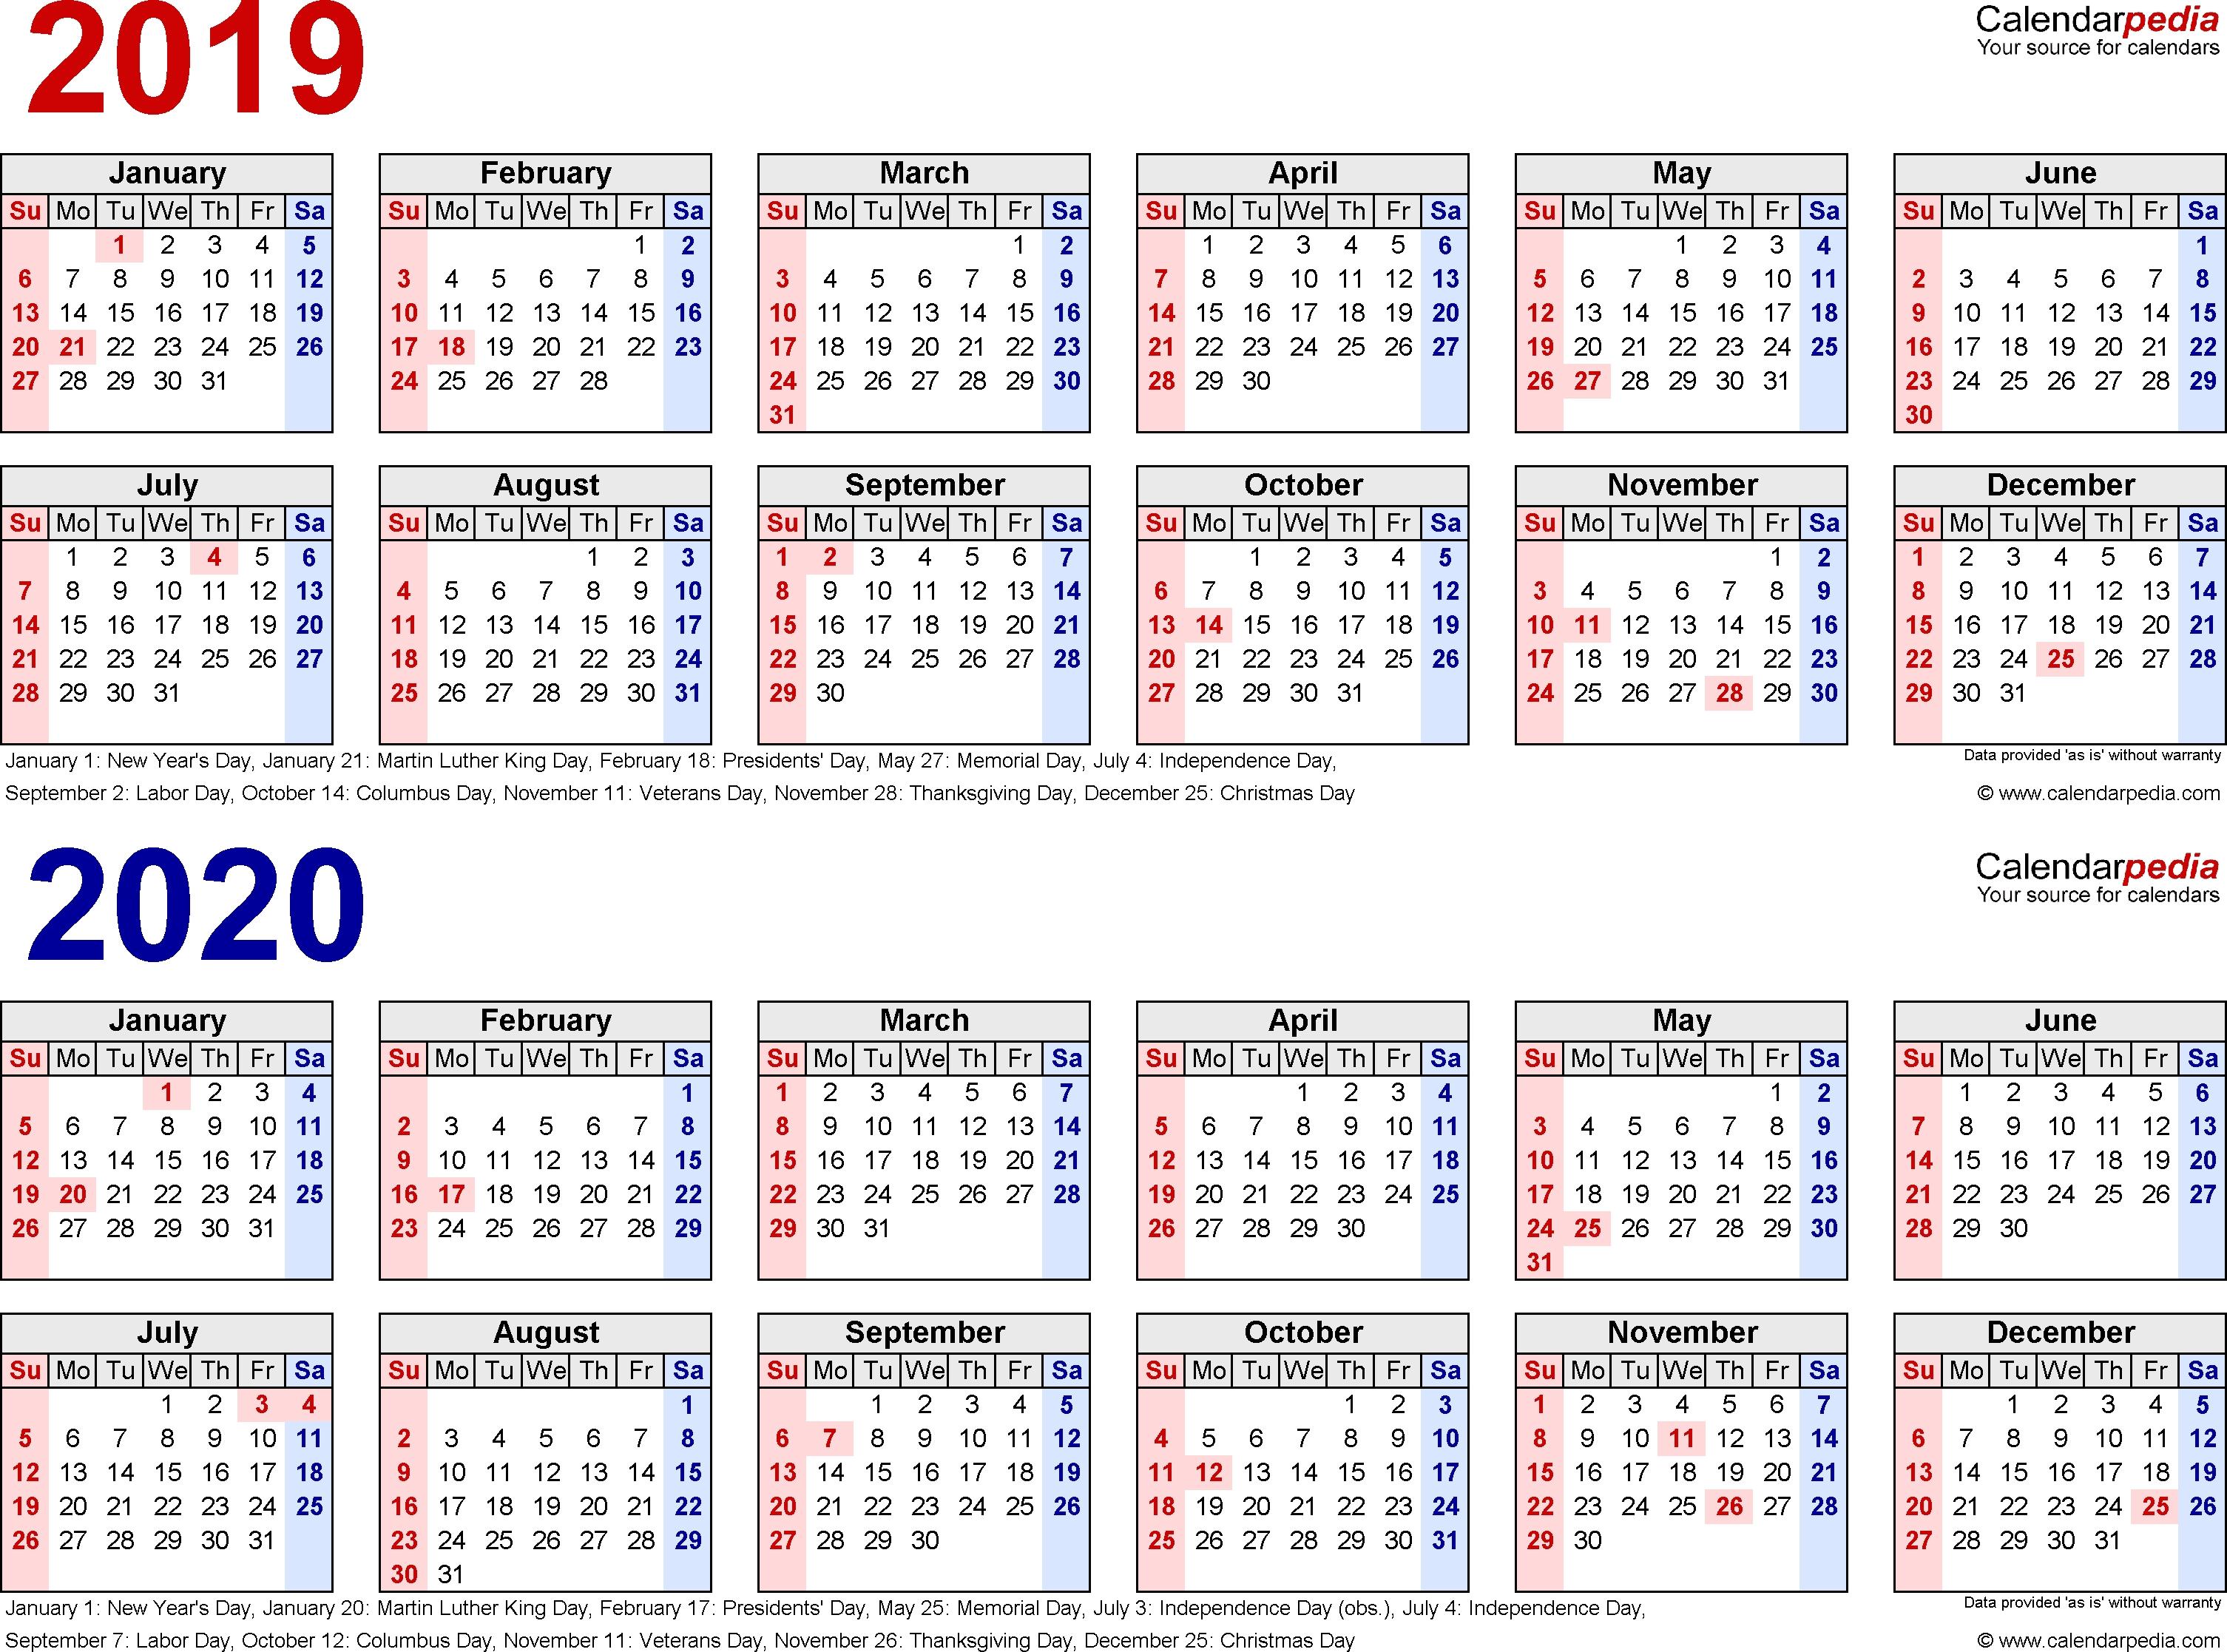 2019-2020 Calendar - Free Printable Two-Year Pdf Calendars in Free Printable 2019 2020 Calendar